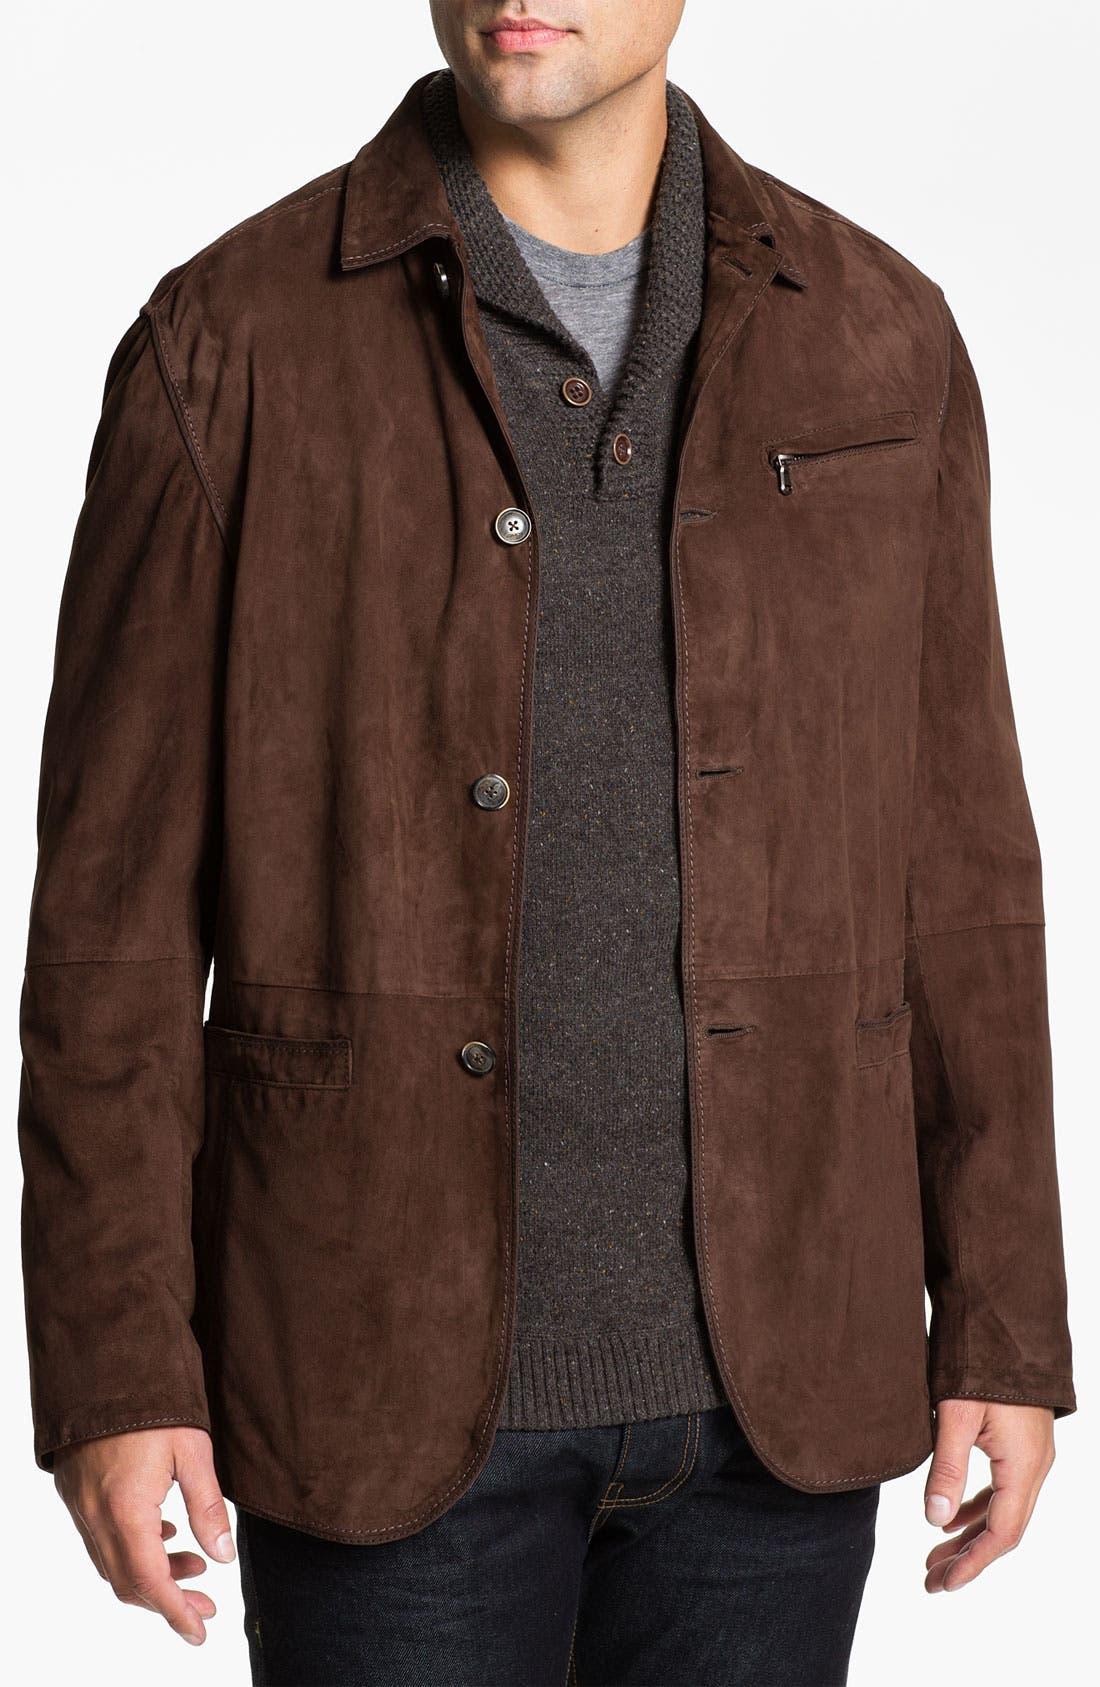 Main Image - Gimo Goatskin Suede Jacket